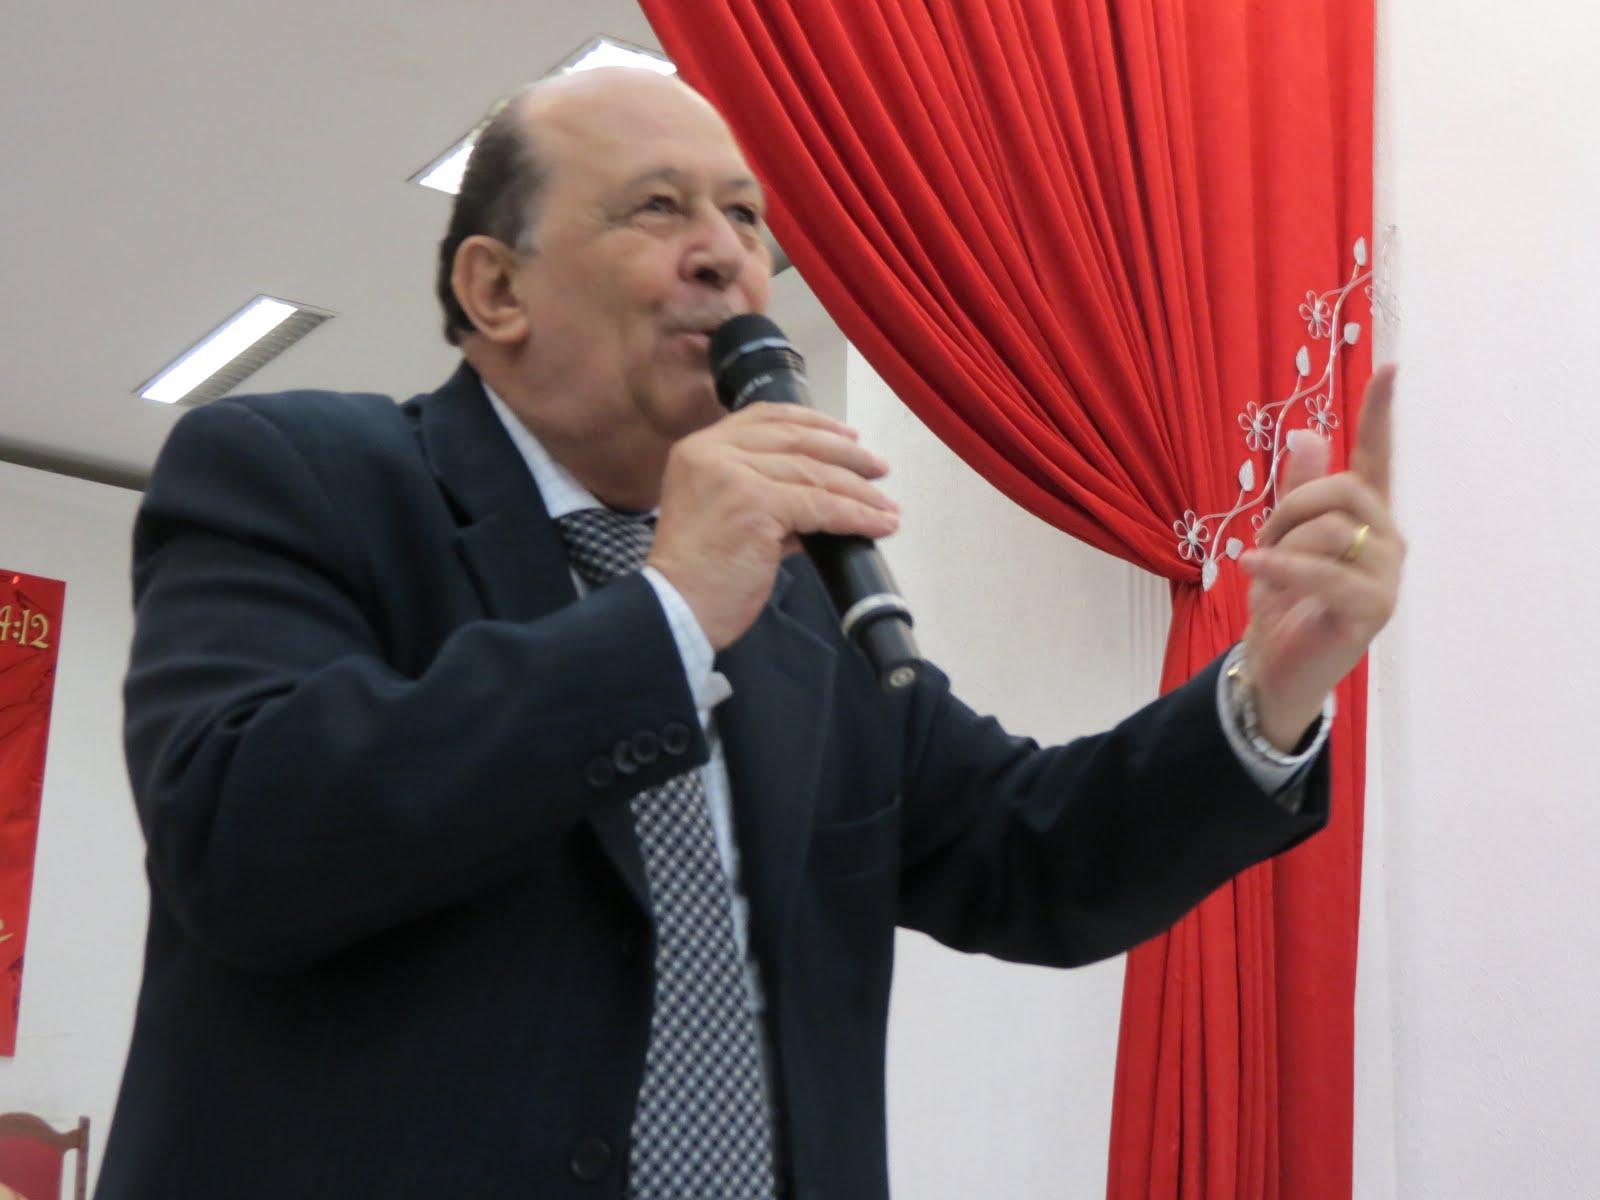 Pastor Delfino Brunelli Júnior